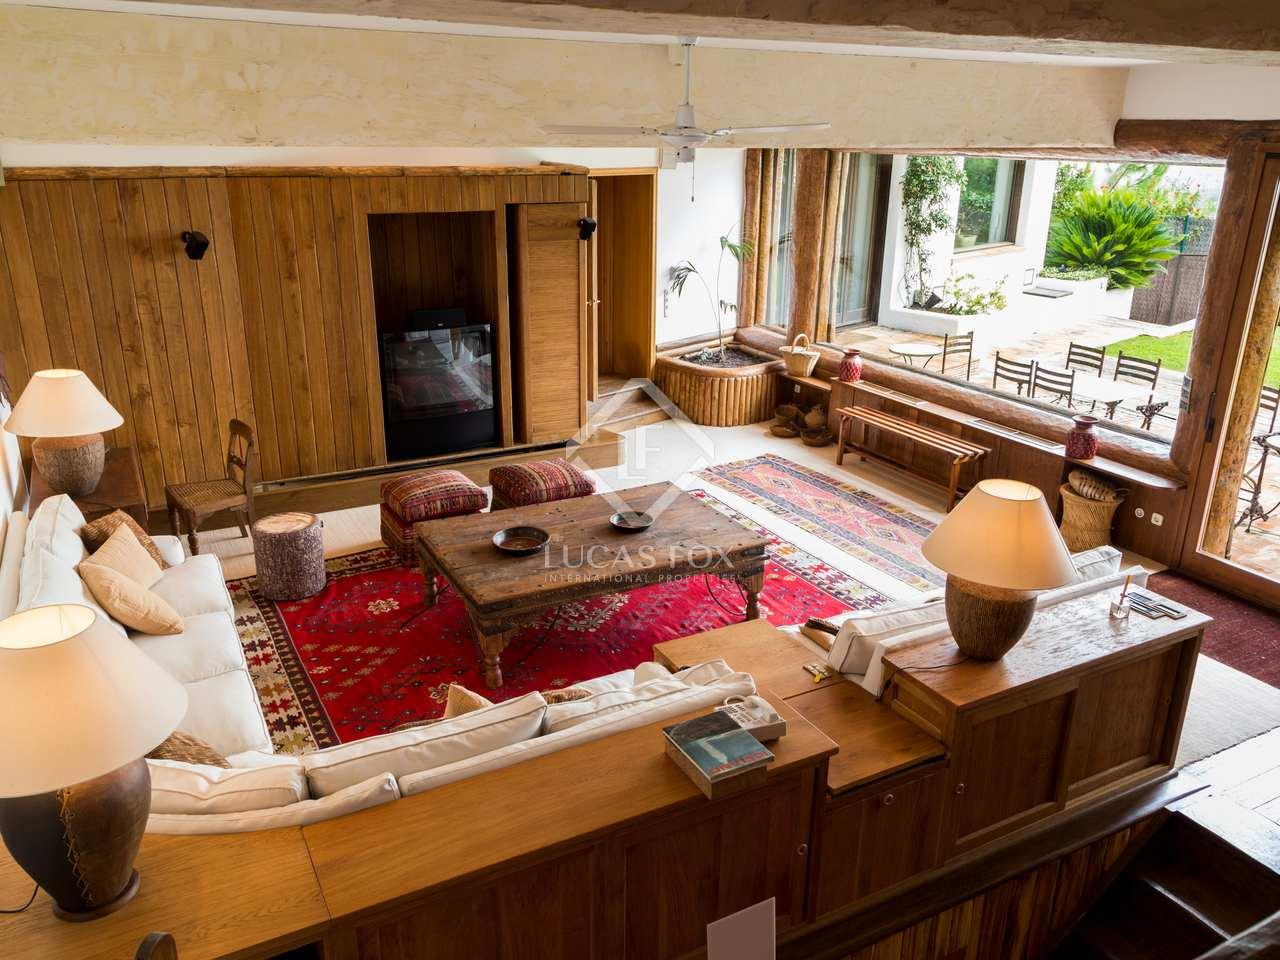 Casa de 450m en alquiler en pedralbes en la zona alta for Casa con jardin alquiler barcelona